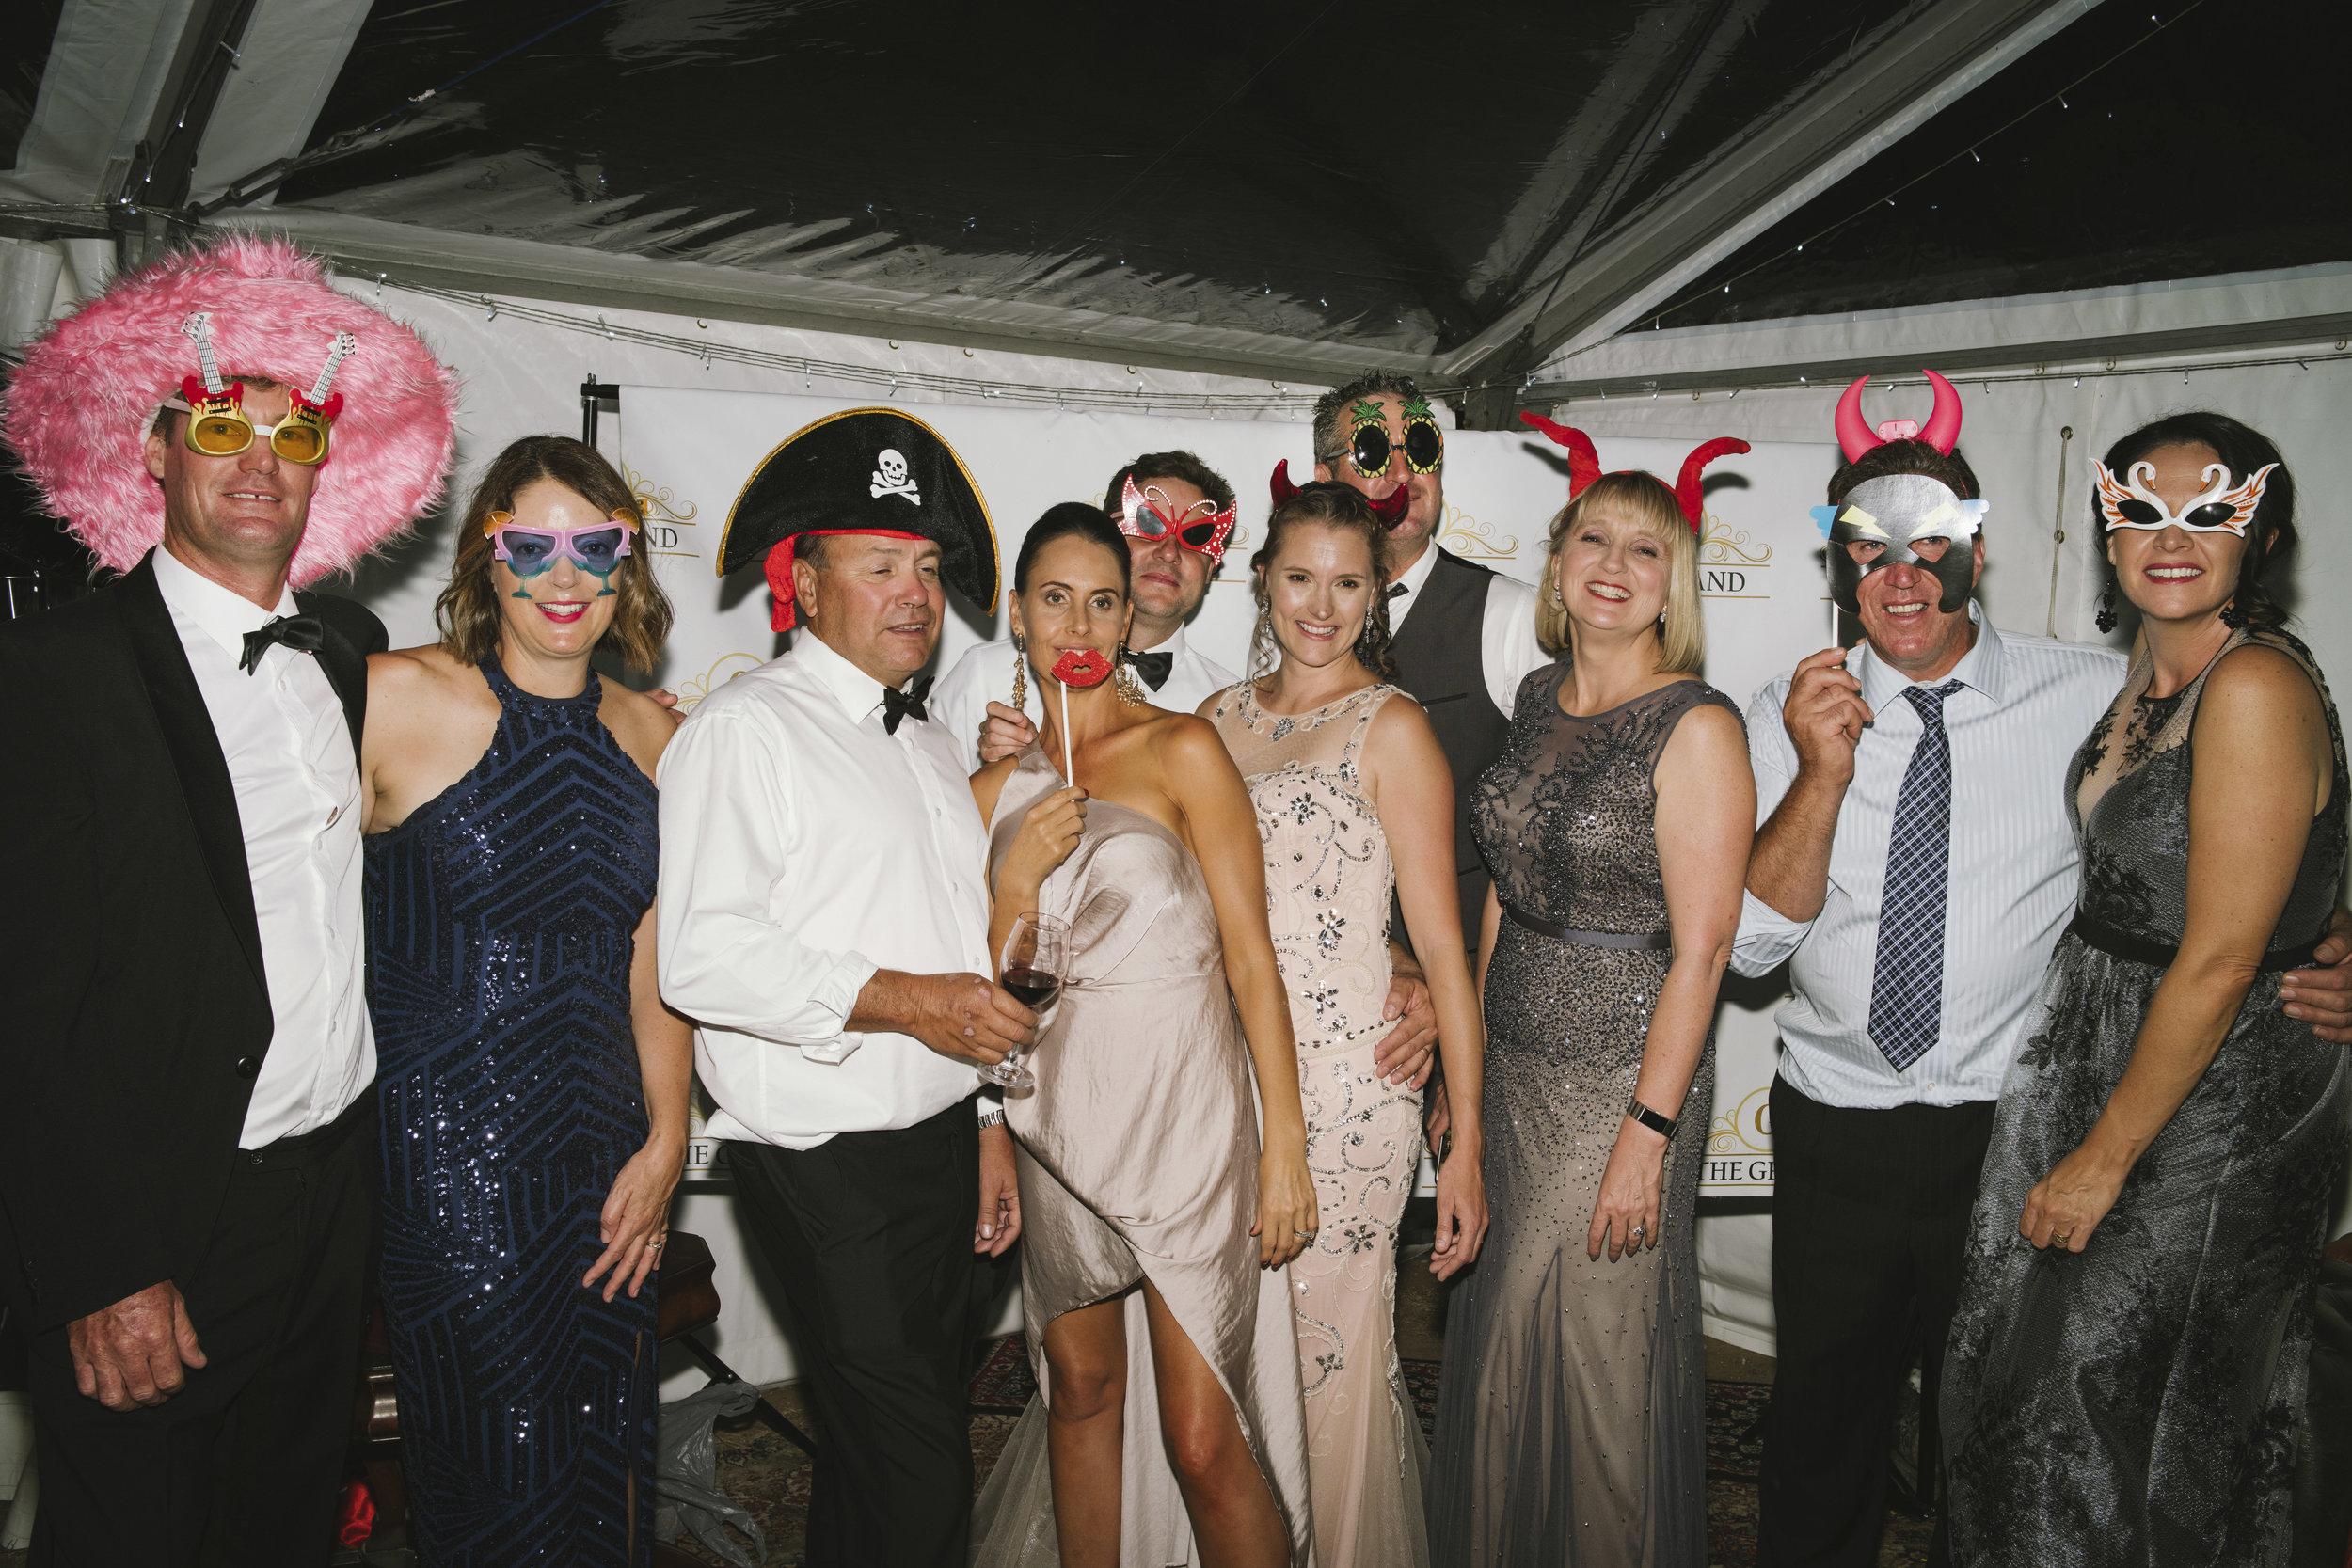 Angie Roe Photography Grand Ball Northam Perth Avon Valley Wheatbelt Event Photographer (47).jpg